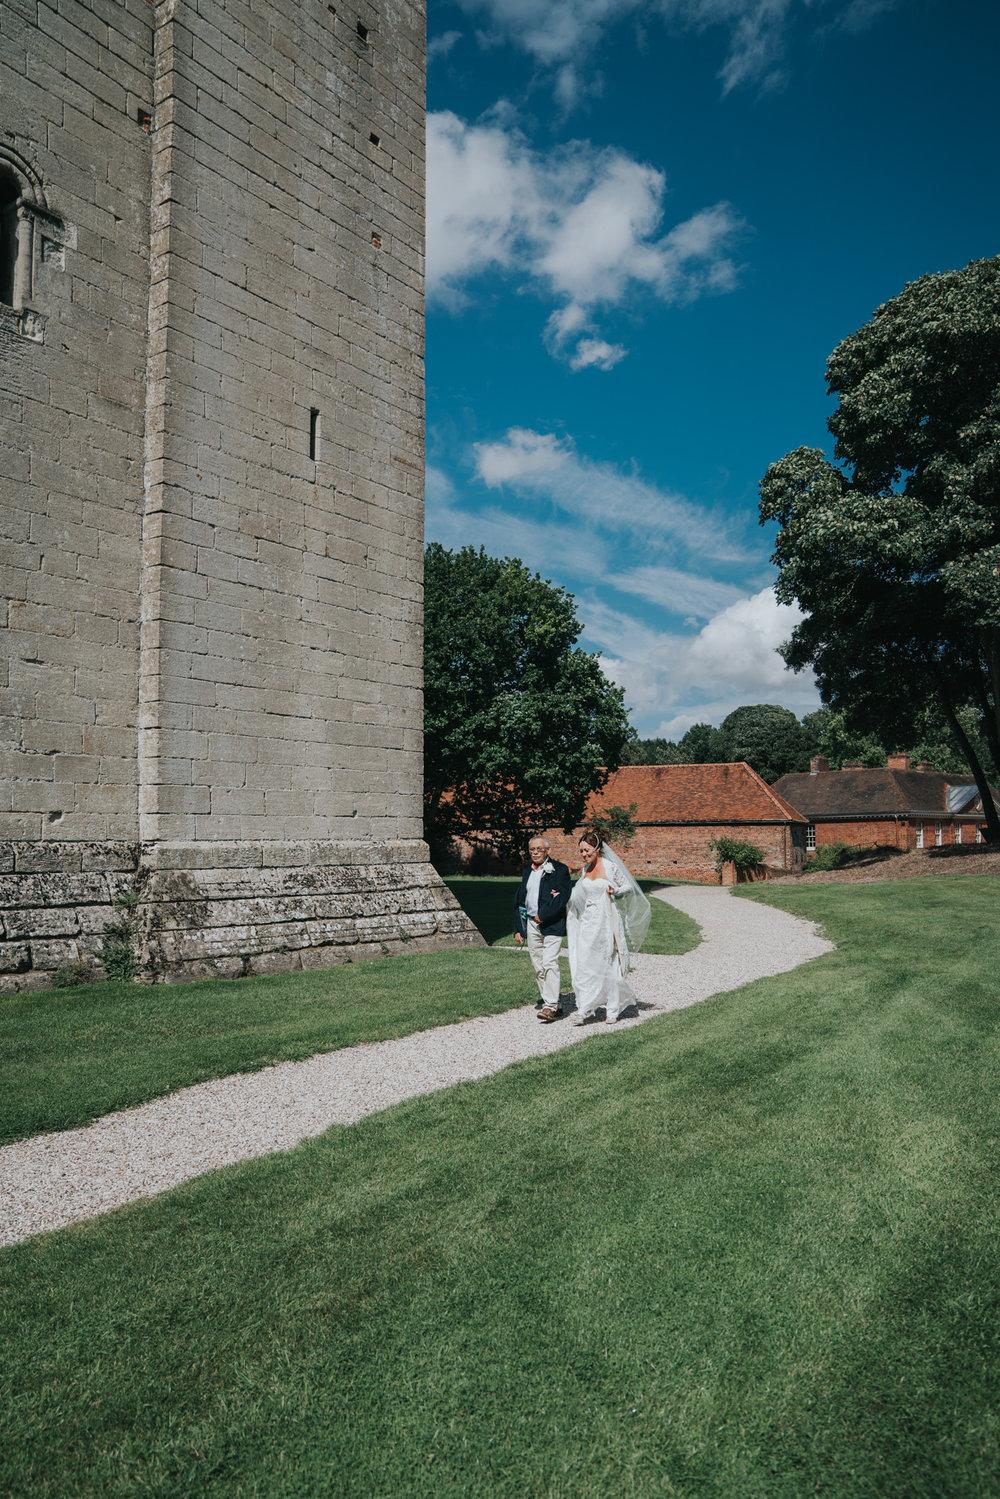 grace-elizabeth-boho-wedding-headingham-castle-essex-wedding-photographer-22.jpg